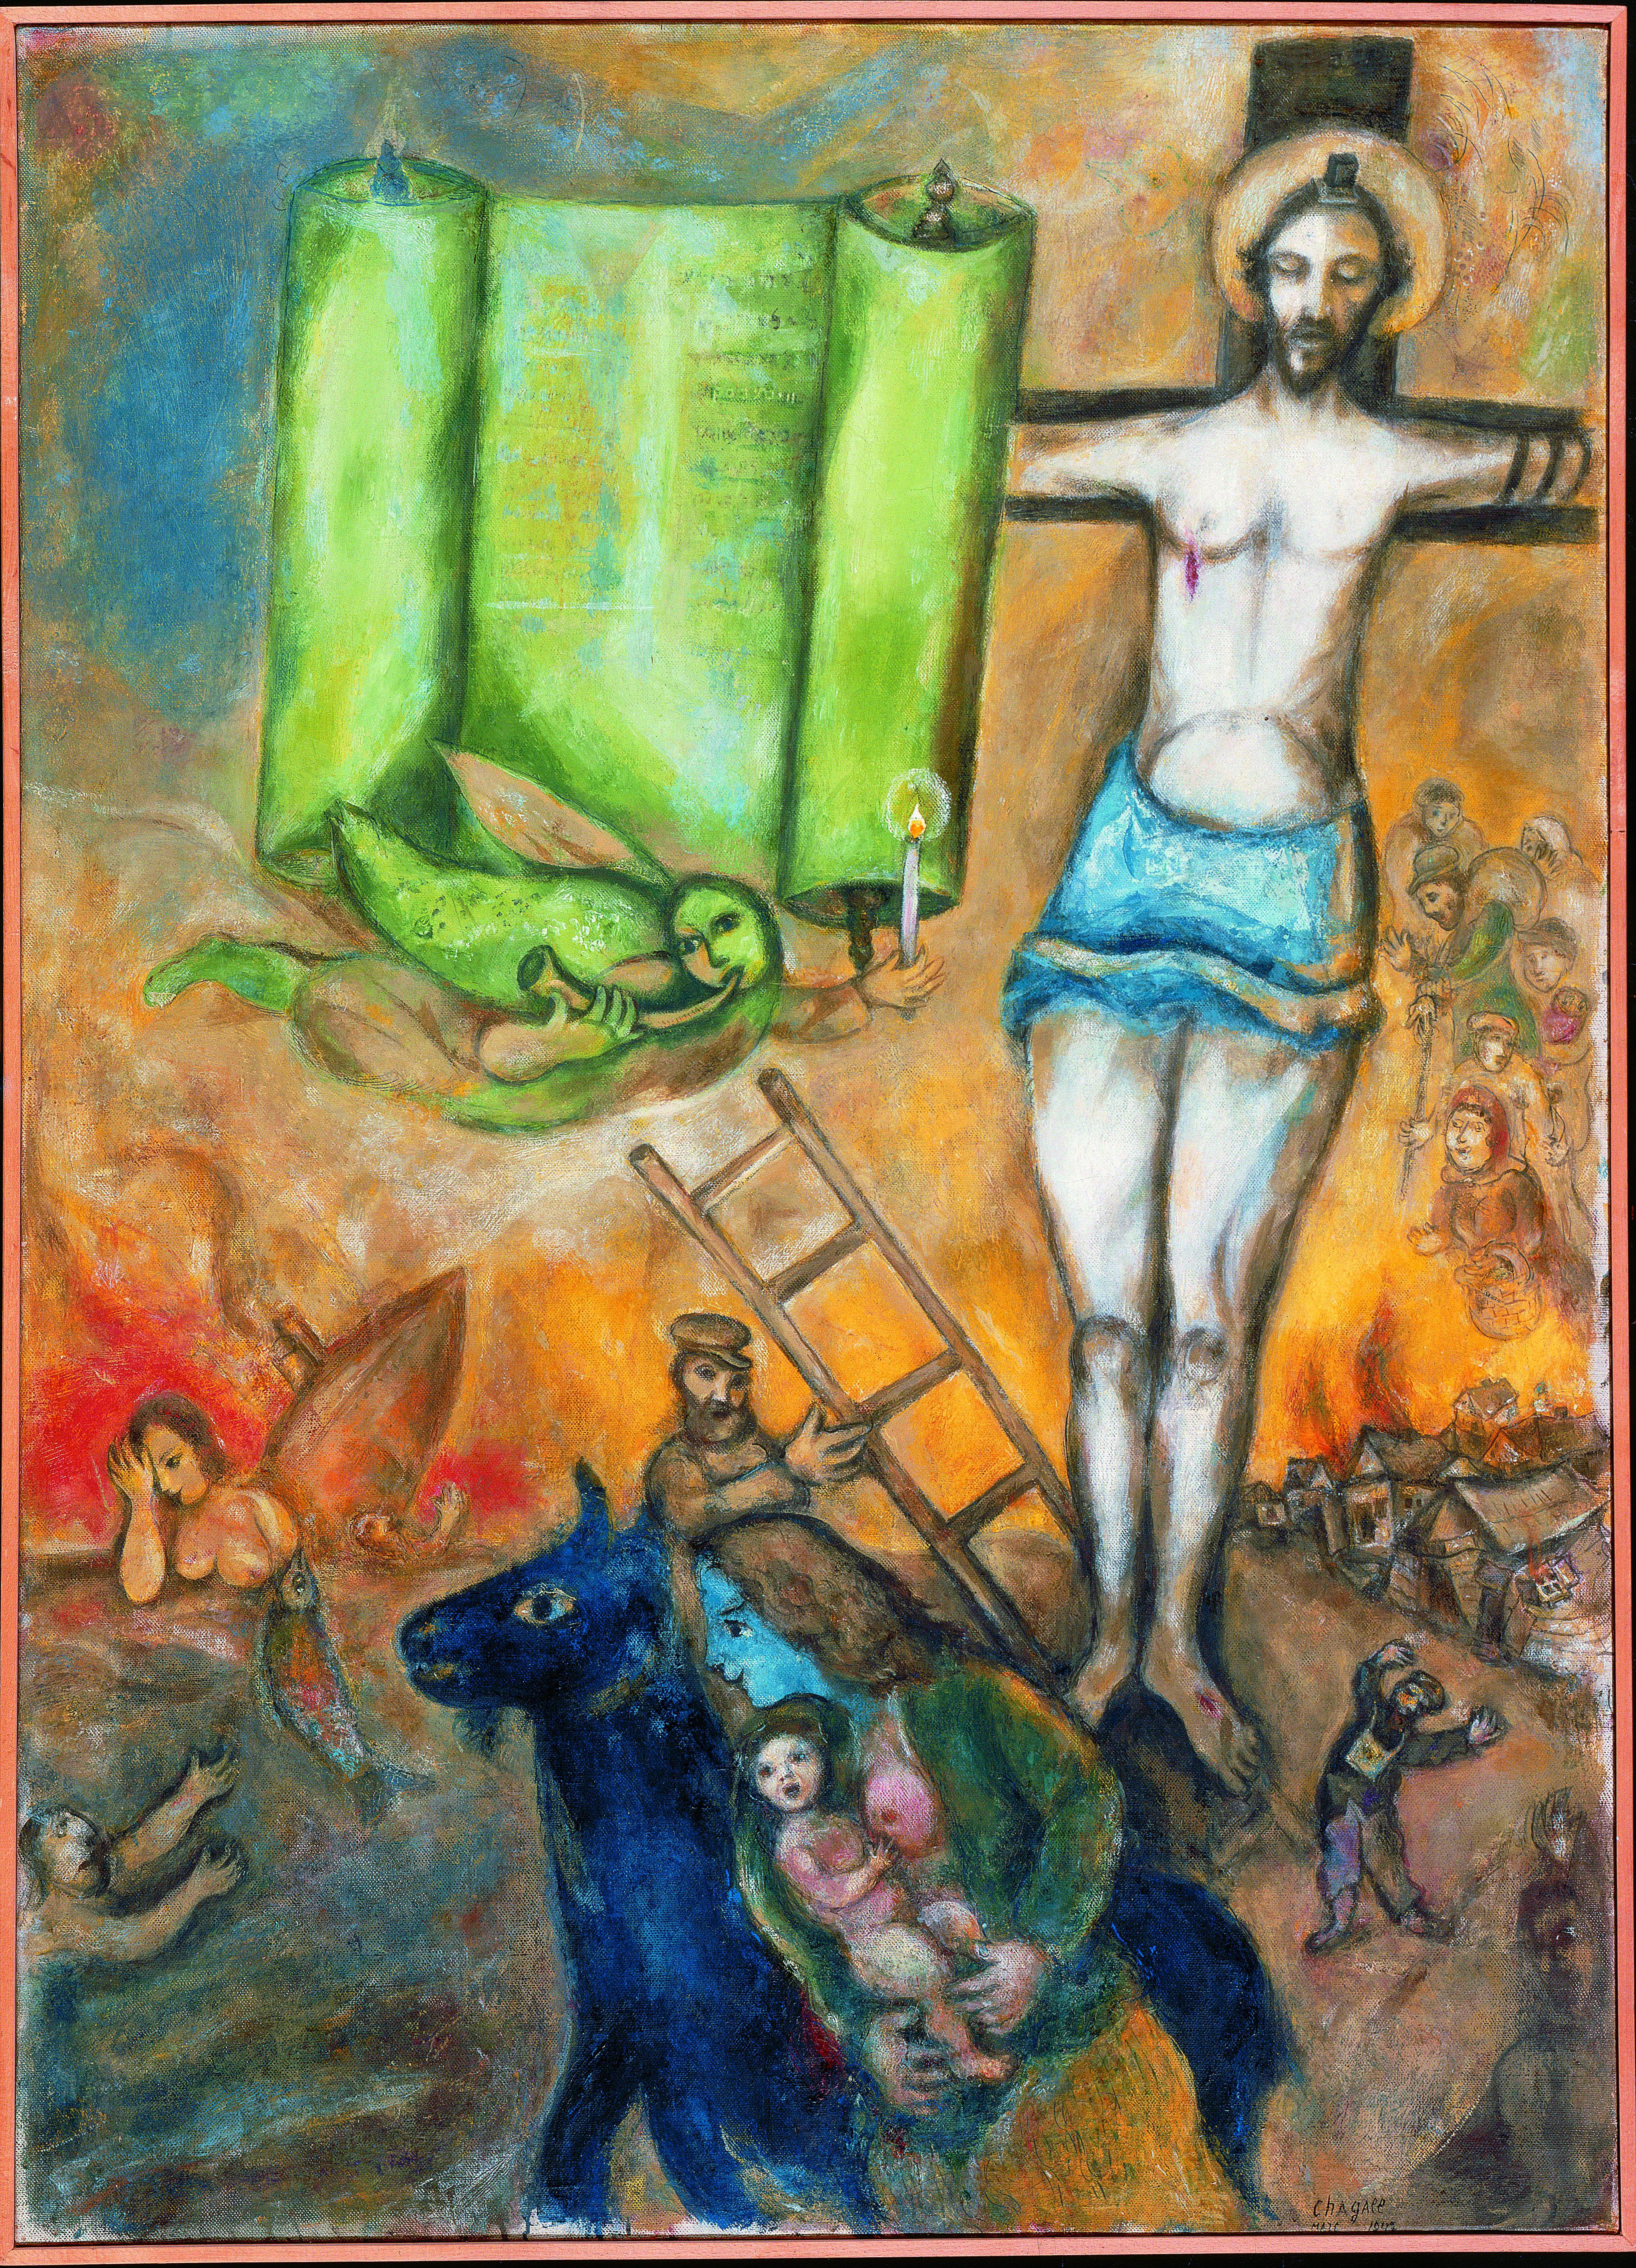 L 39 evasion des sens chagall le merveilleux for Chagall tableau